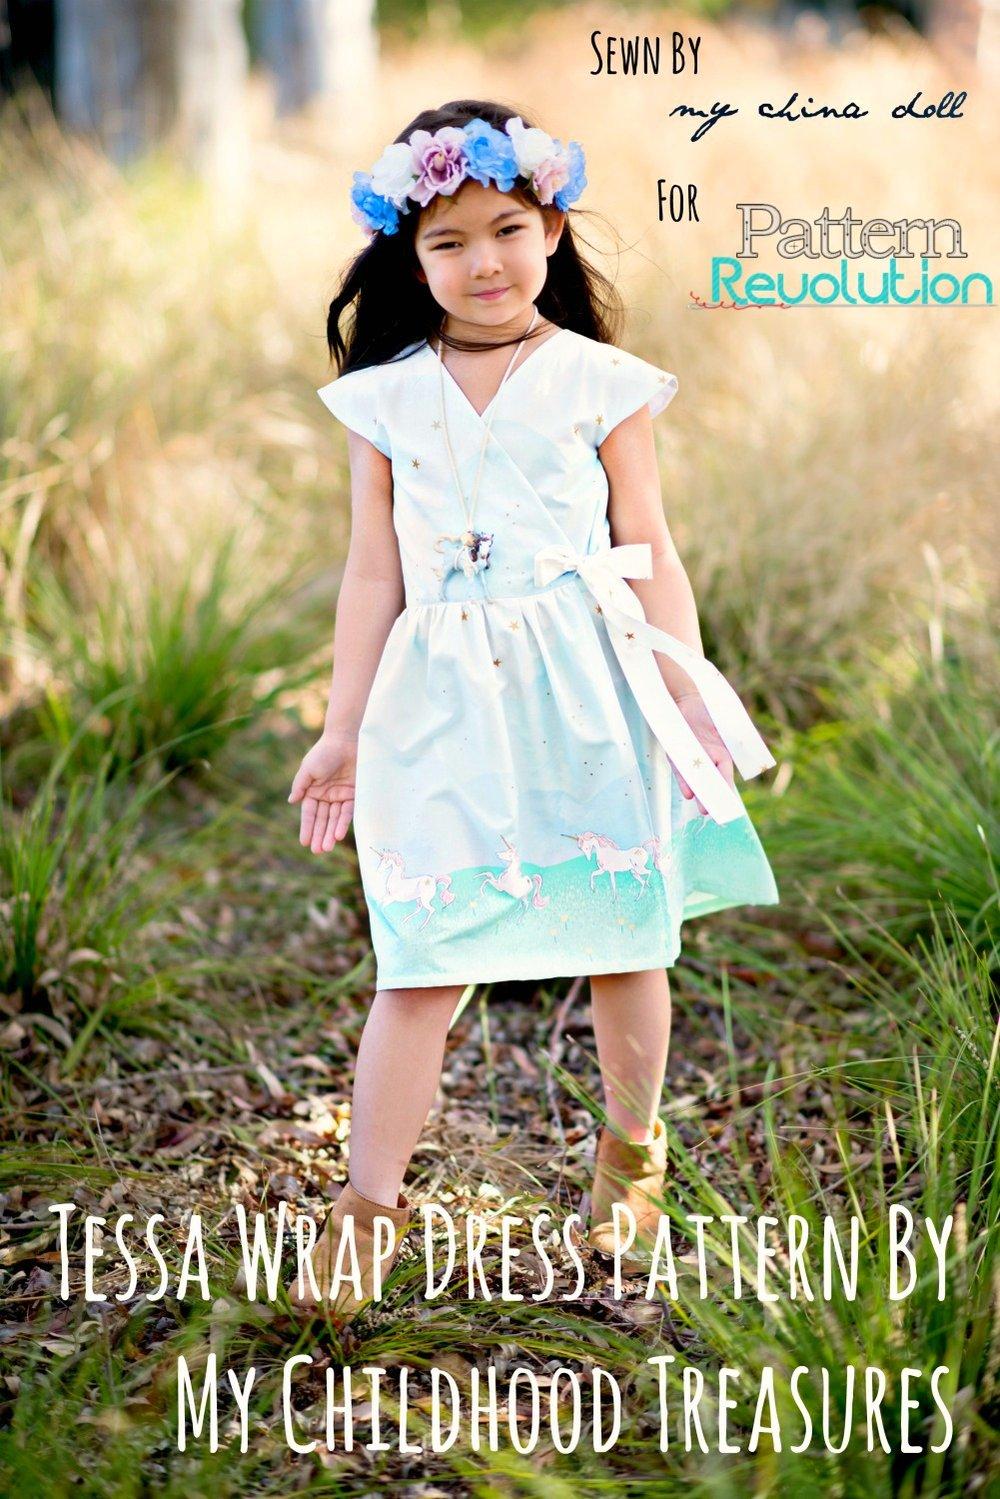 tessa wrap dress COVER 2.jpg